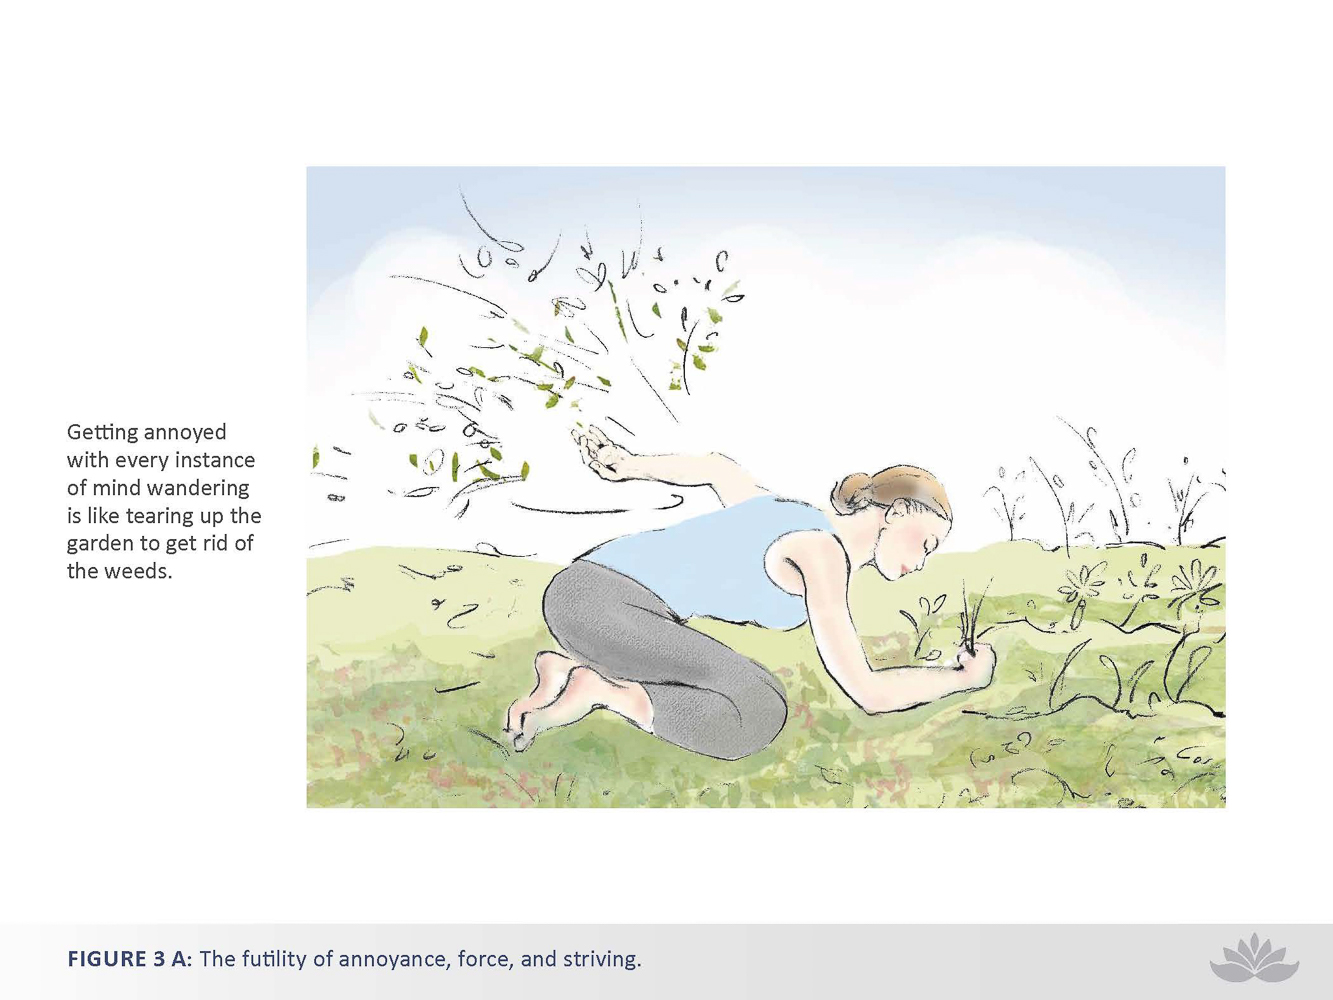 nwd-illustration-32-2.jpg